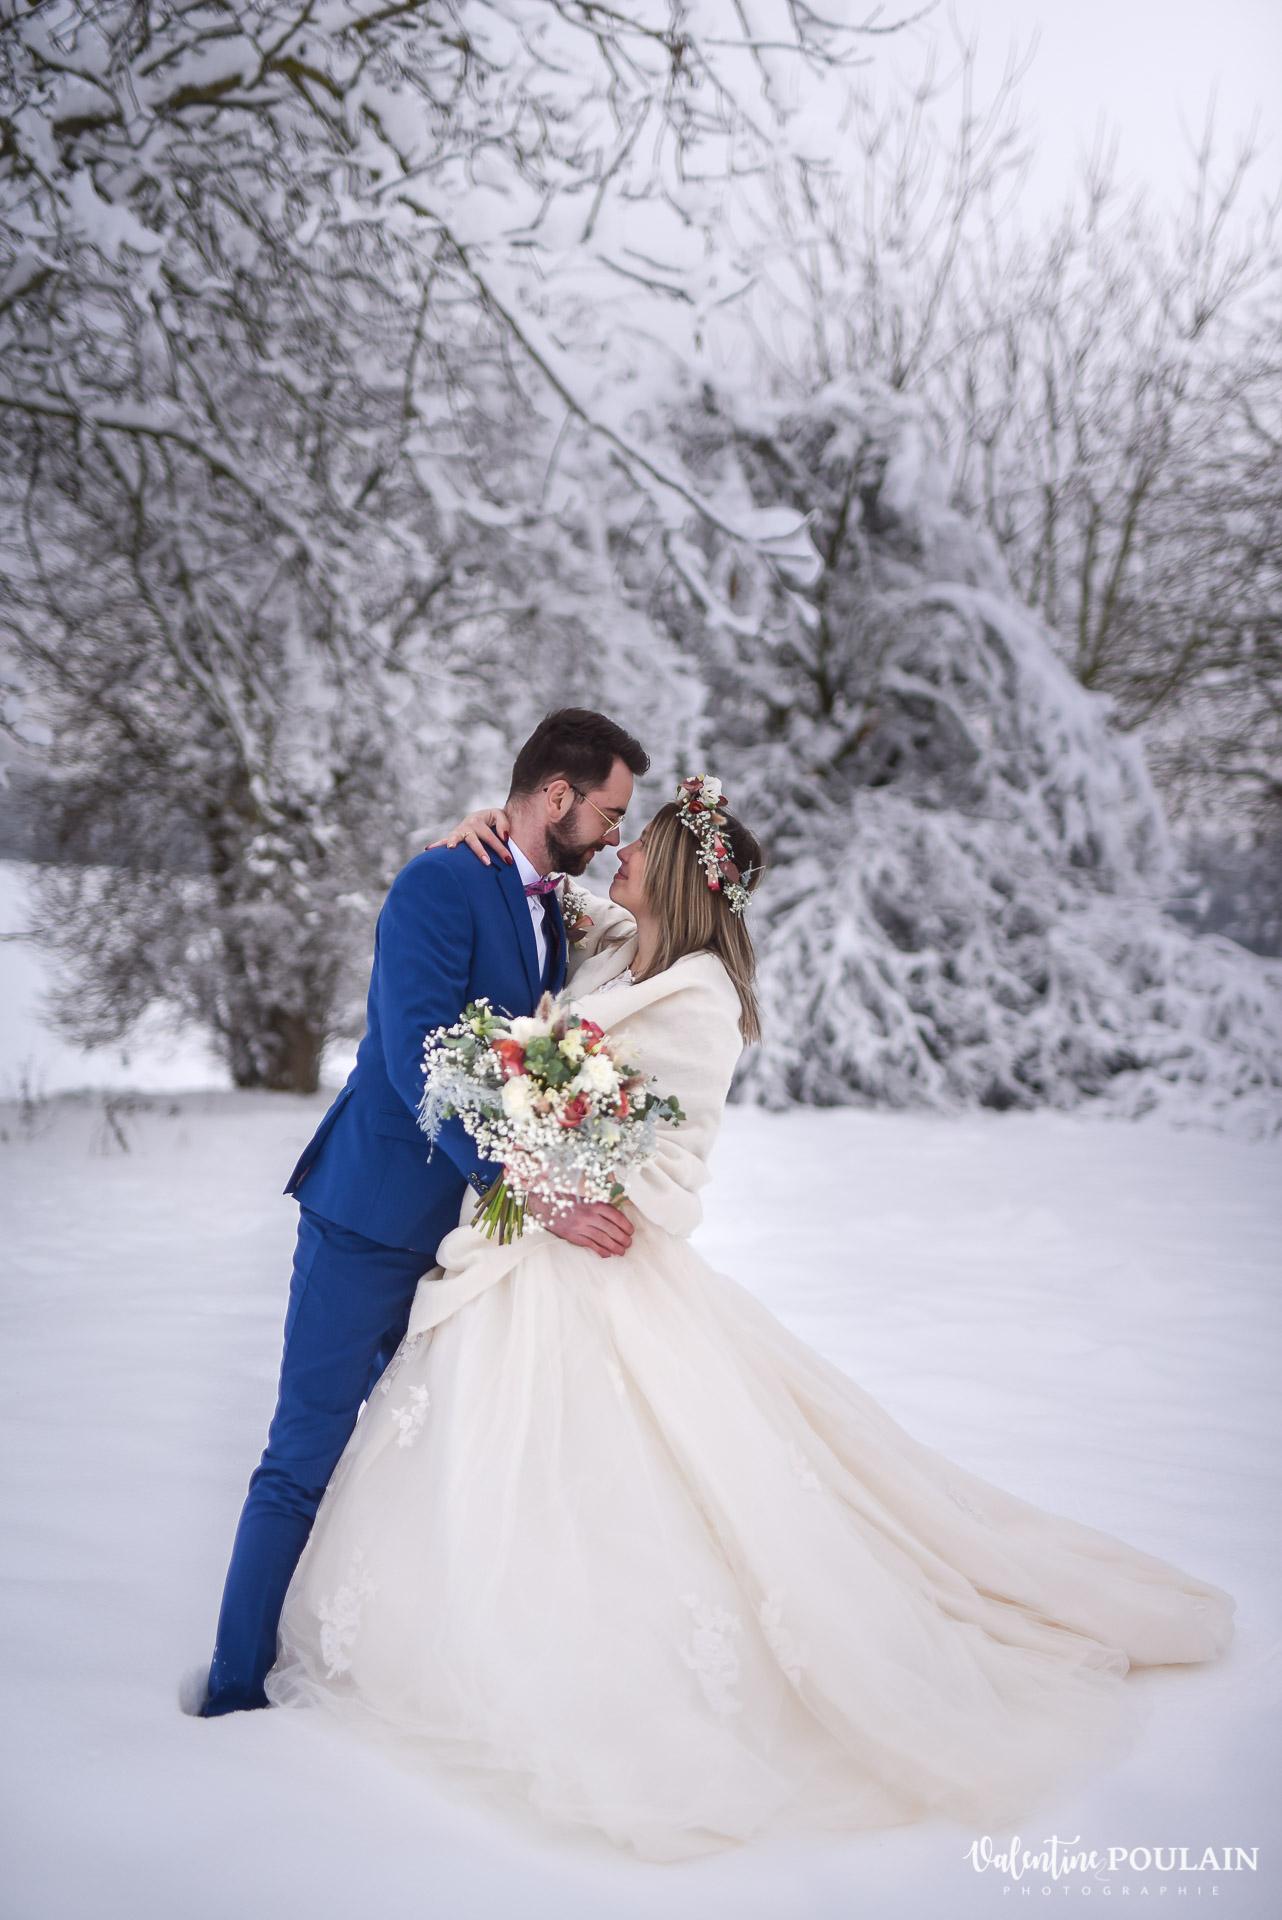 Photo mariage neige hiver - Valentine Poulain rock